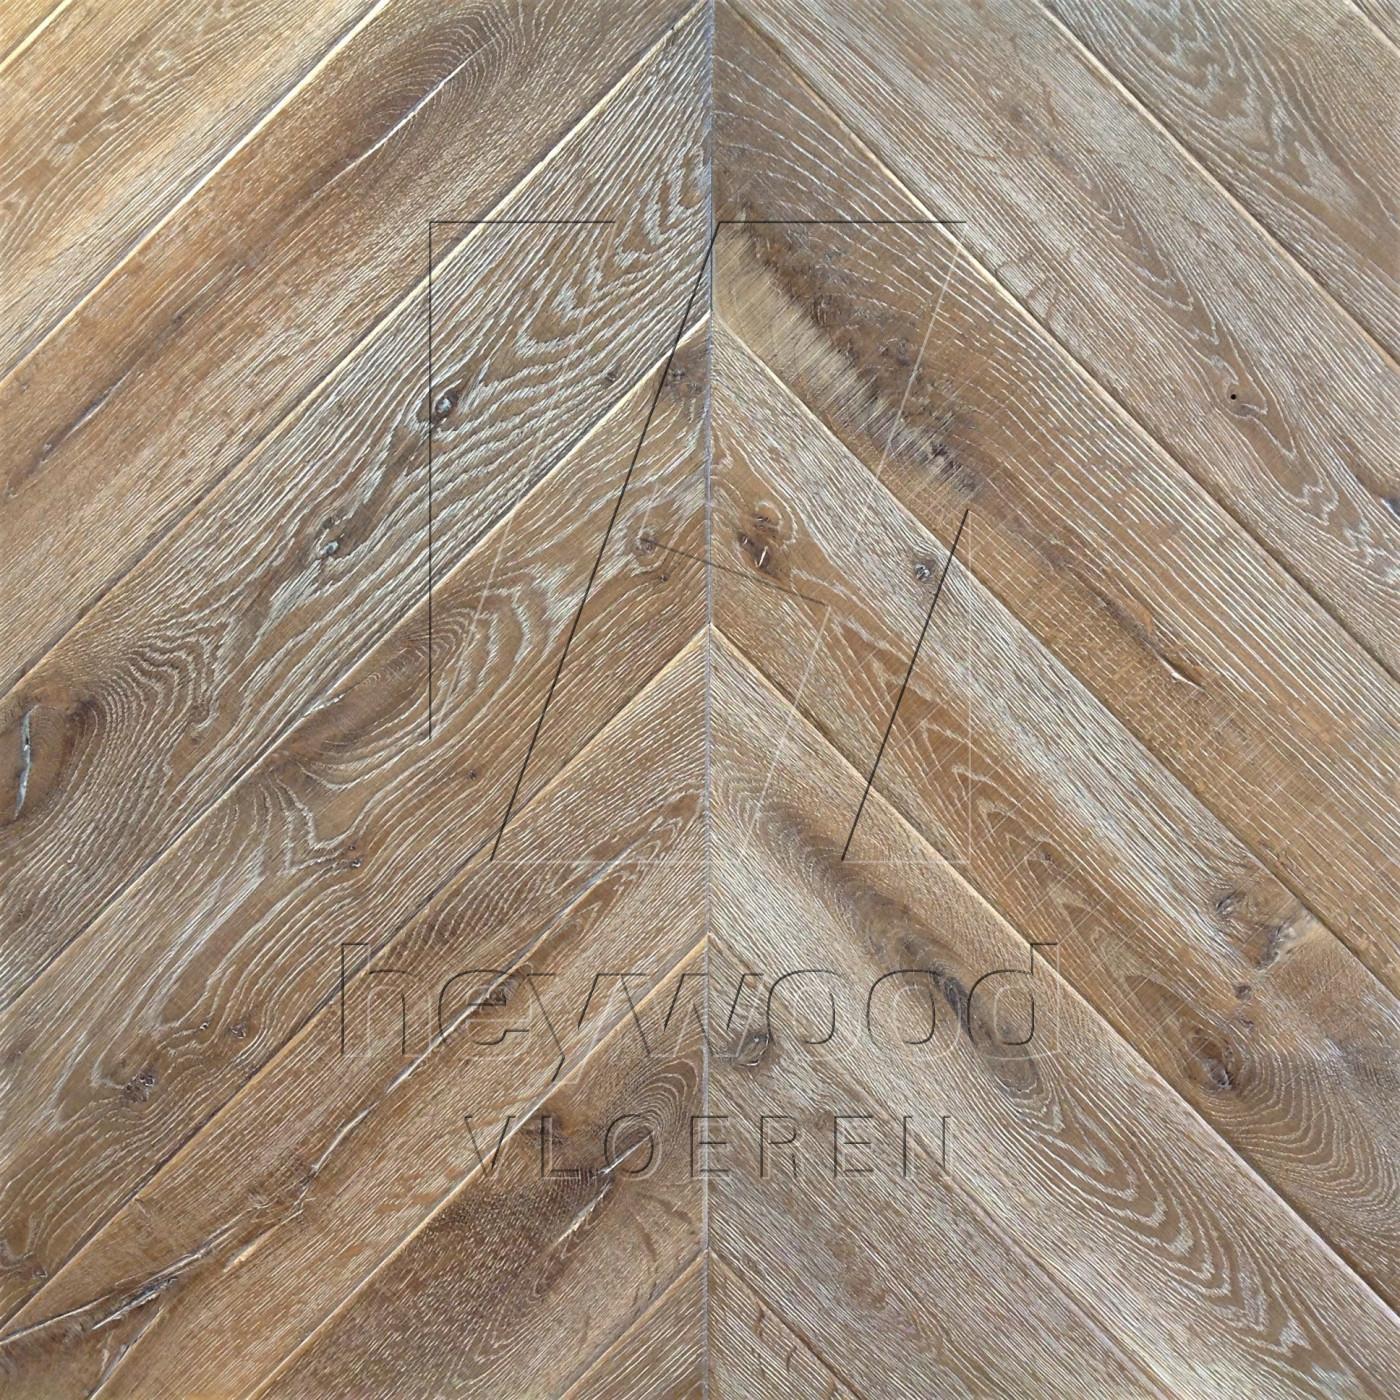 Knotting Hill Chevron 'Gotland' in Chevron of Pattern & Panel Floors